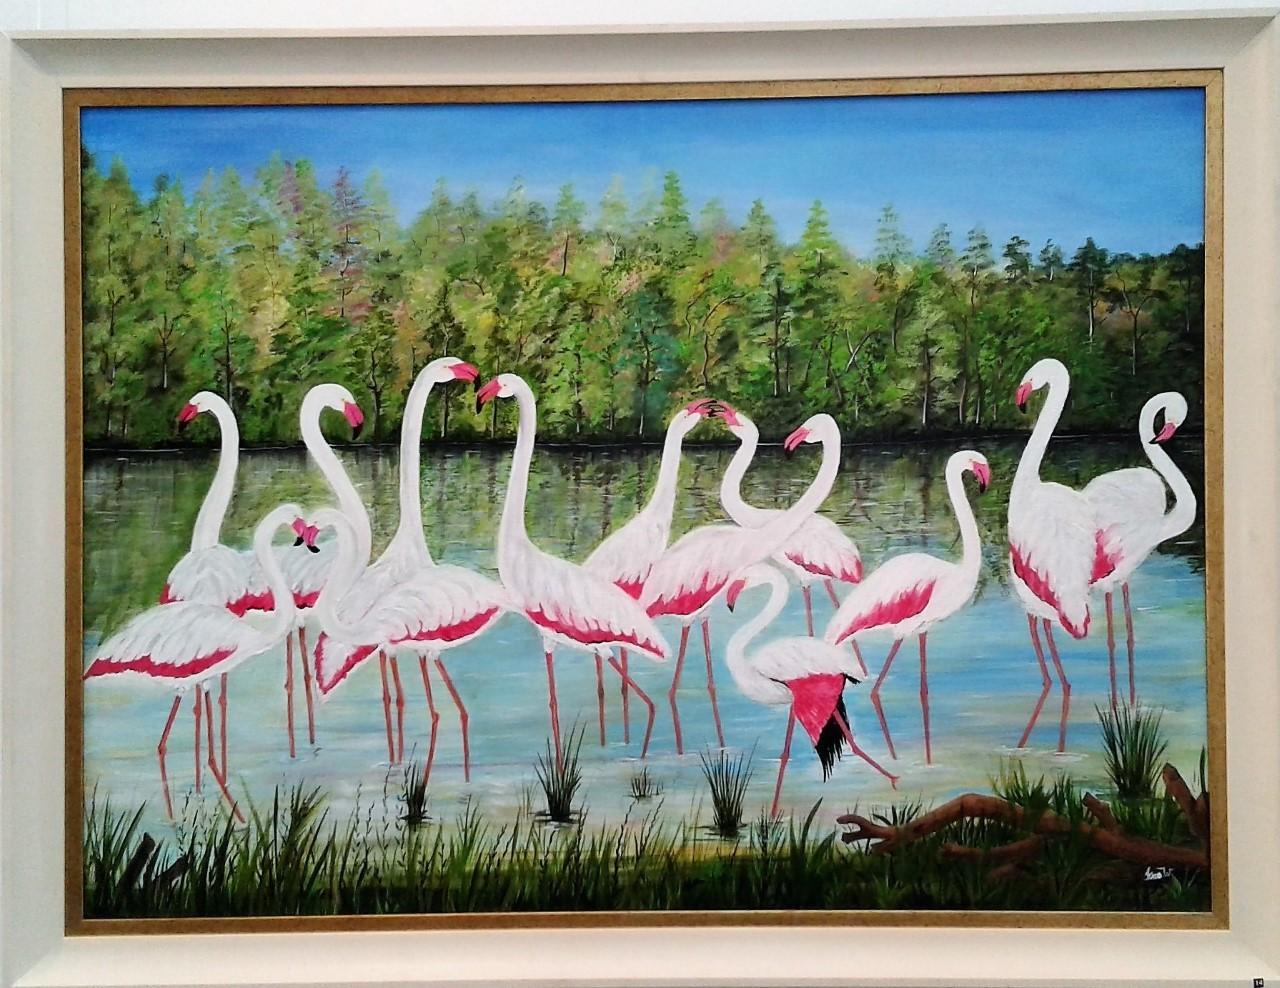 A Flamboyance of Flamingos by Iranganie Wickramasinghe